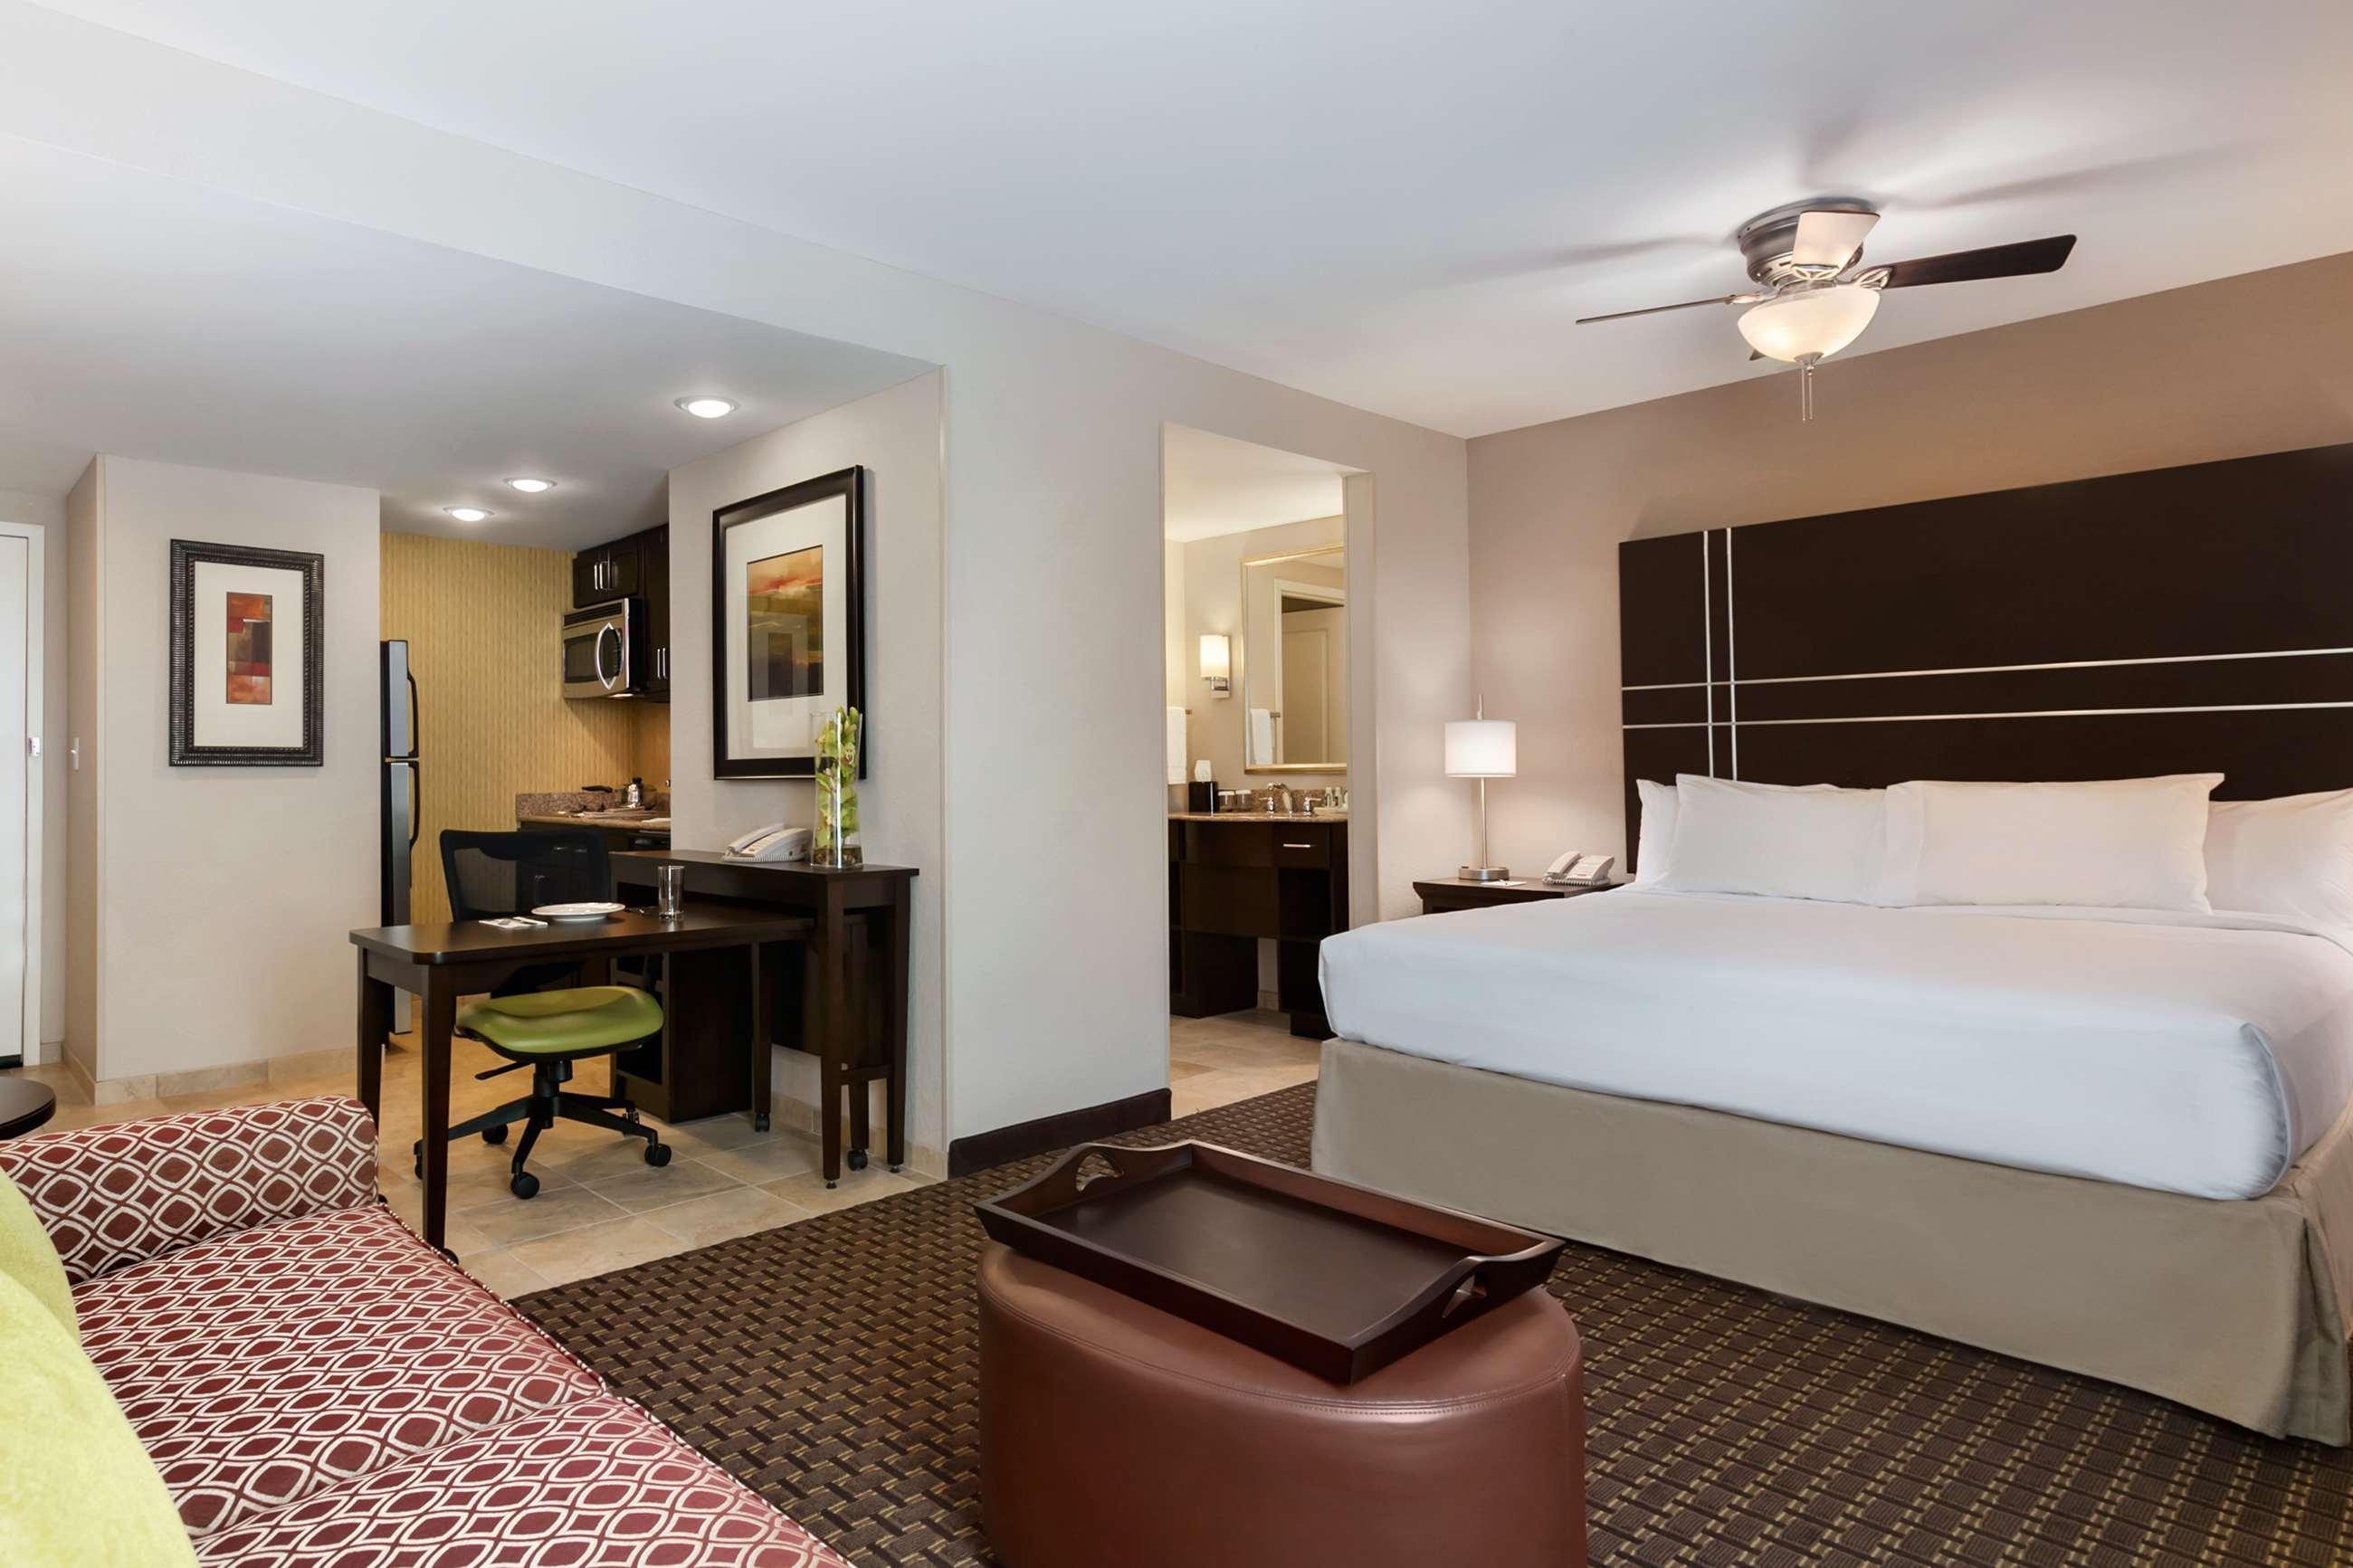 Homewood Suites by Hilton Joplin, MO image 8